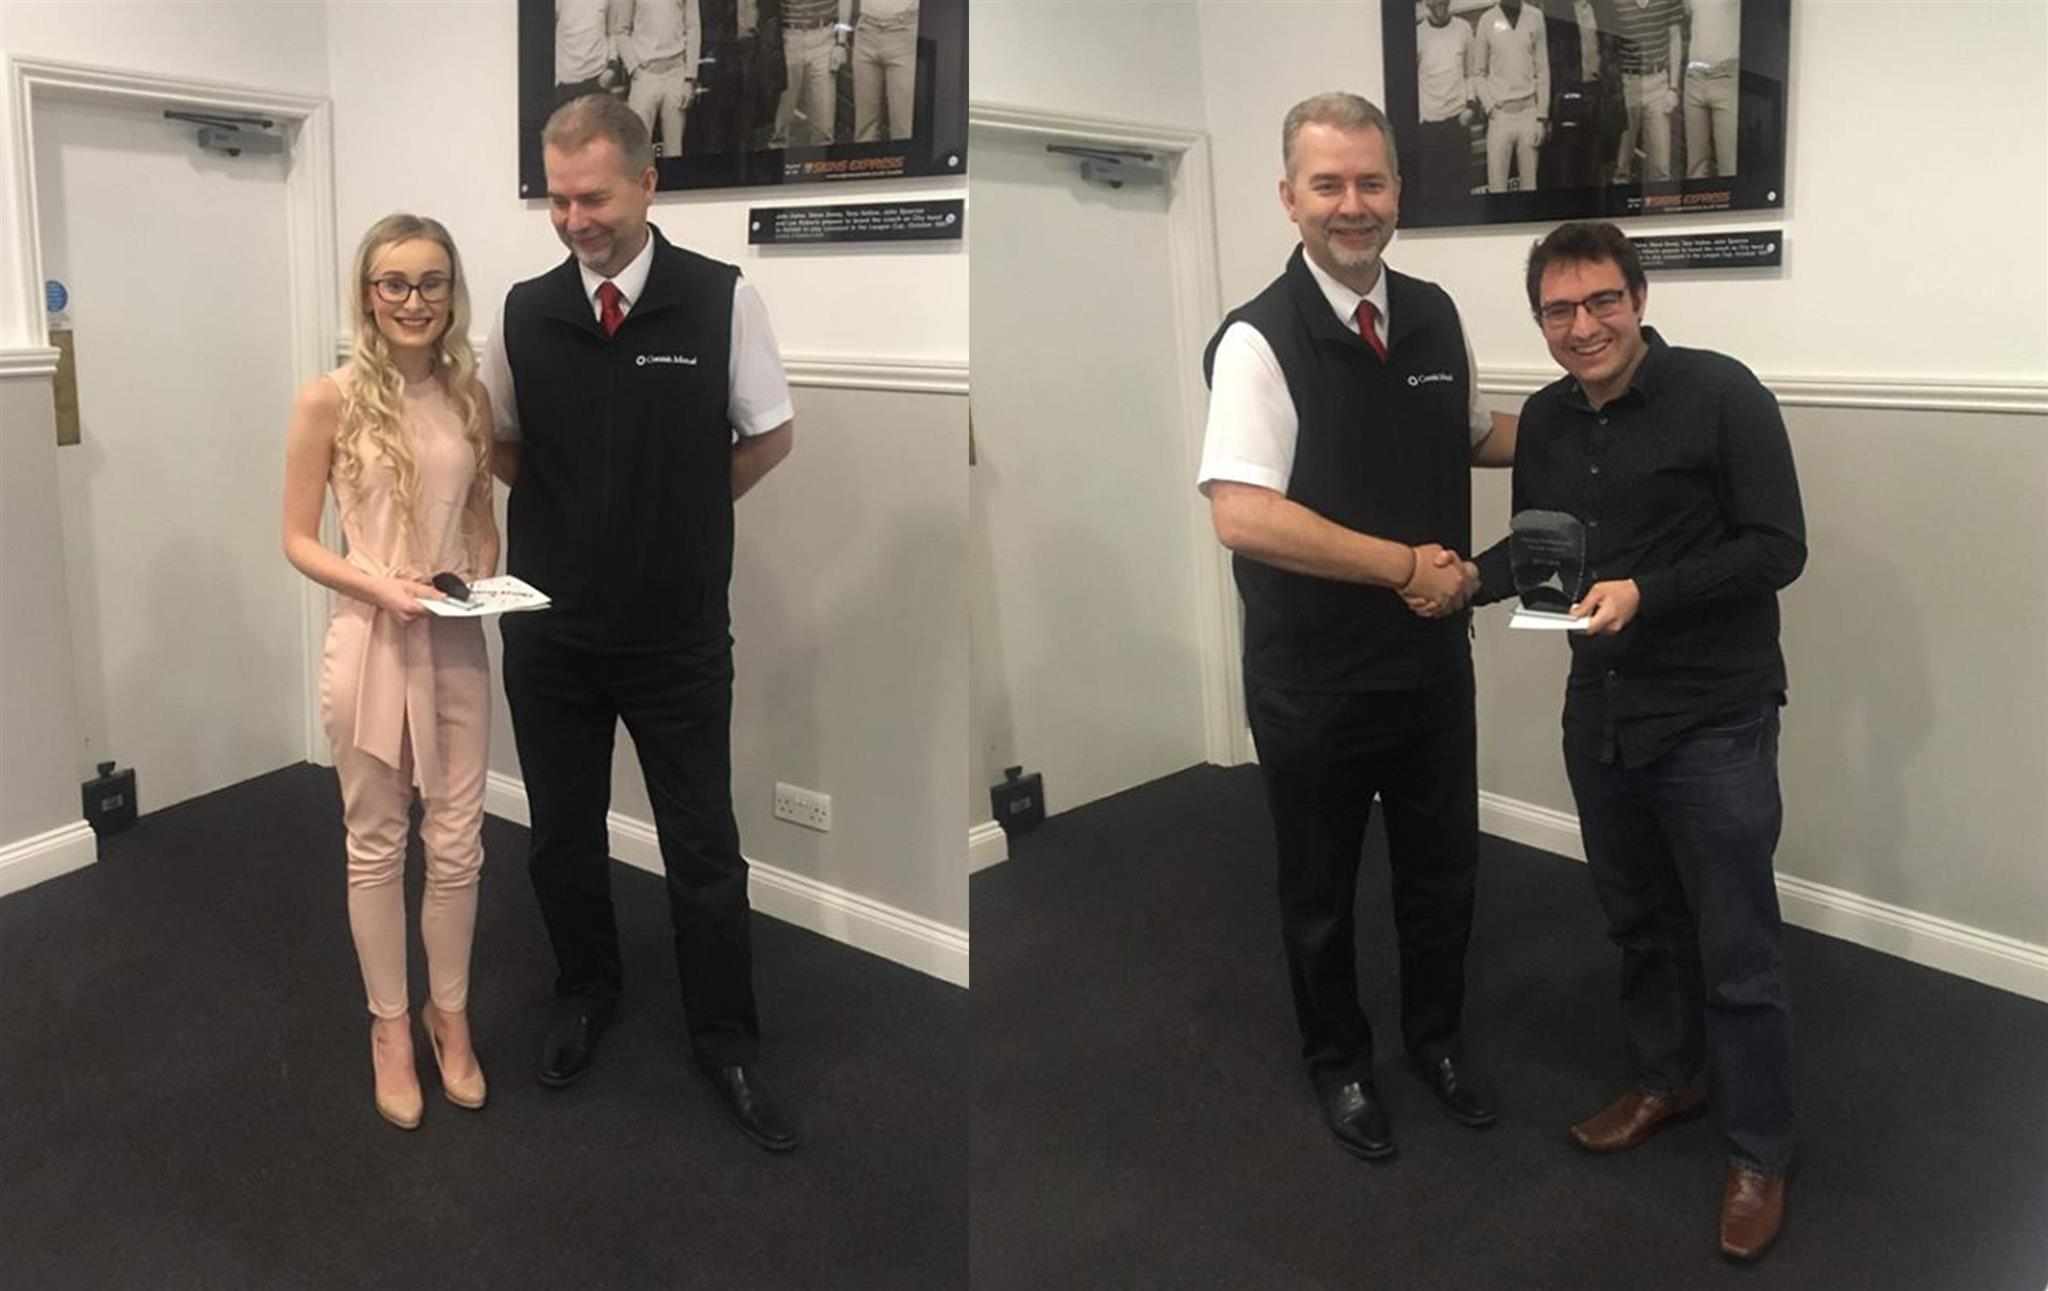 Loretta and Joe receive CII awards